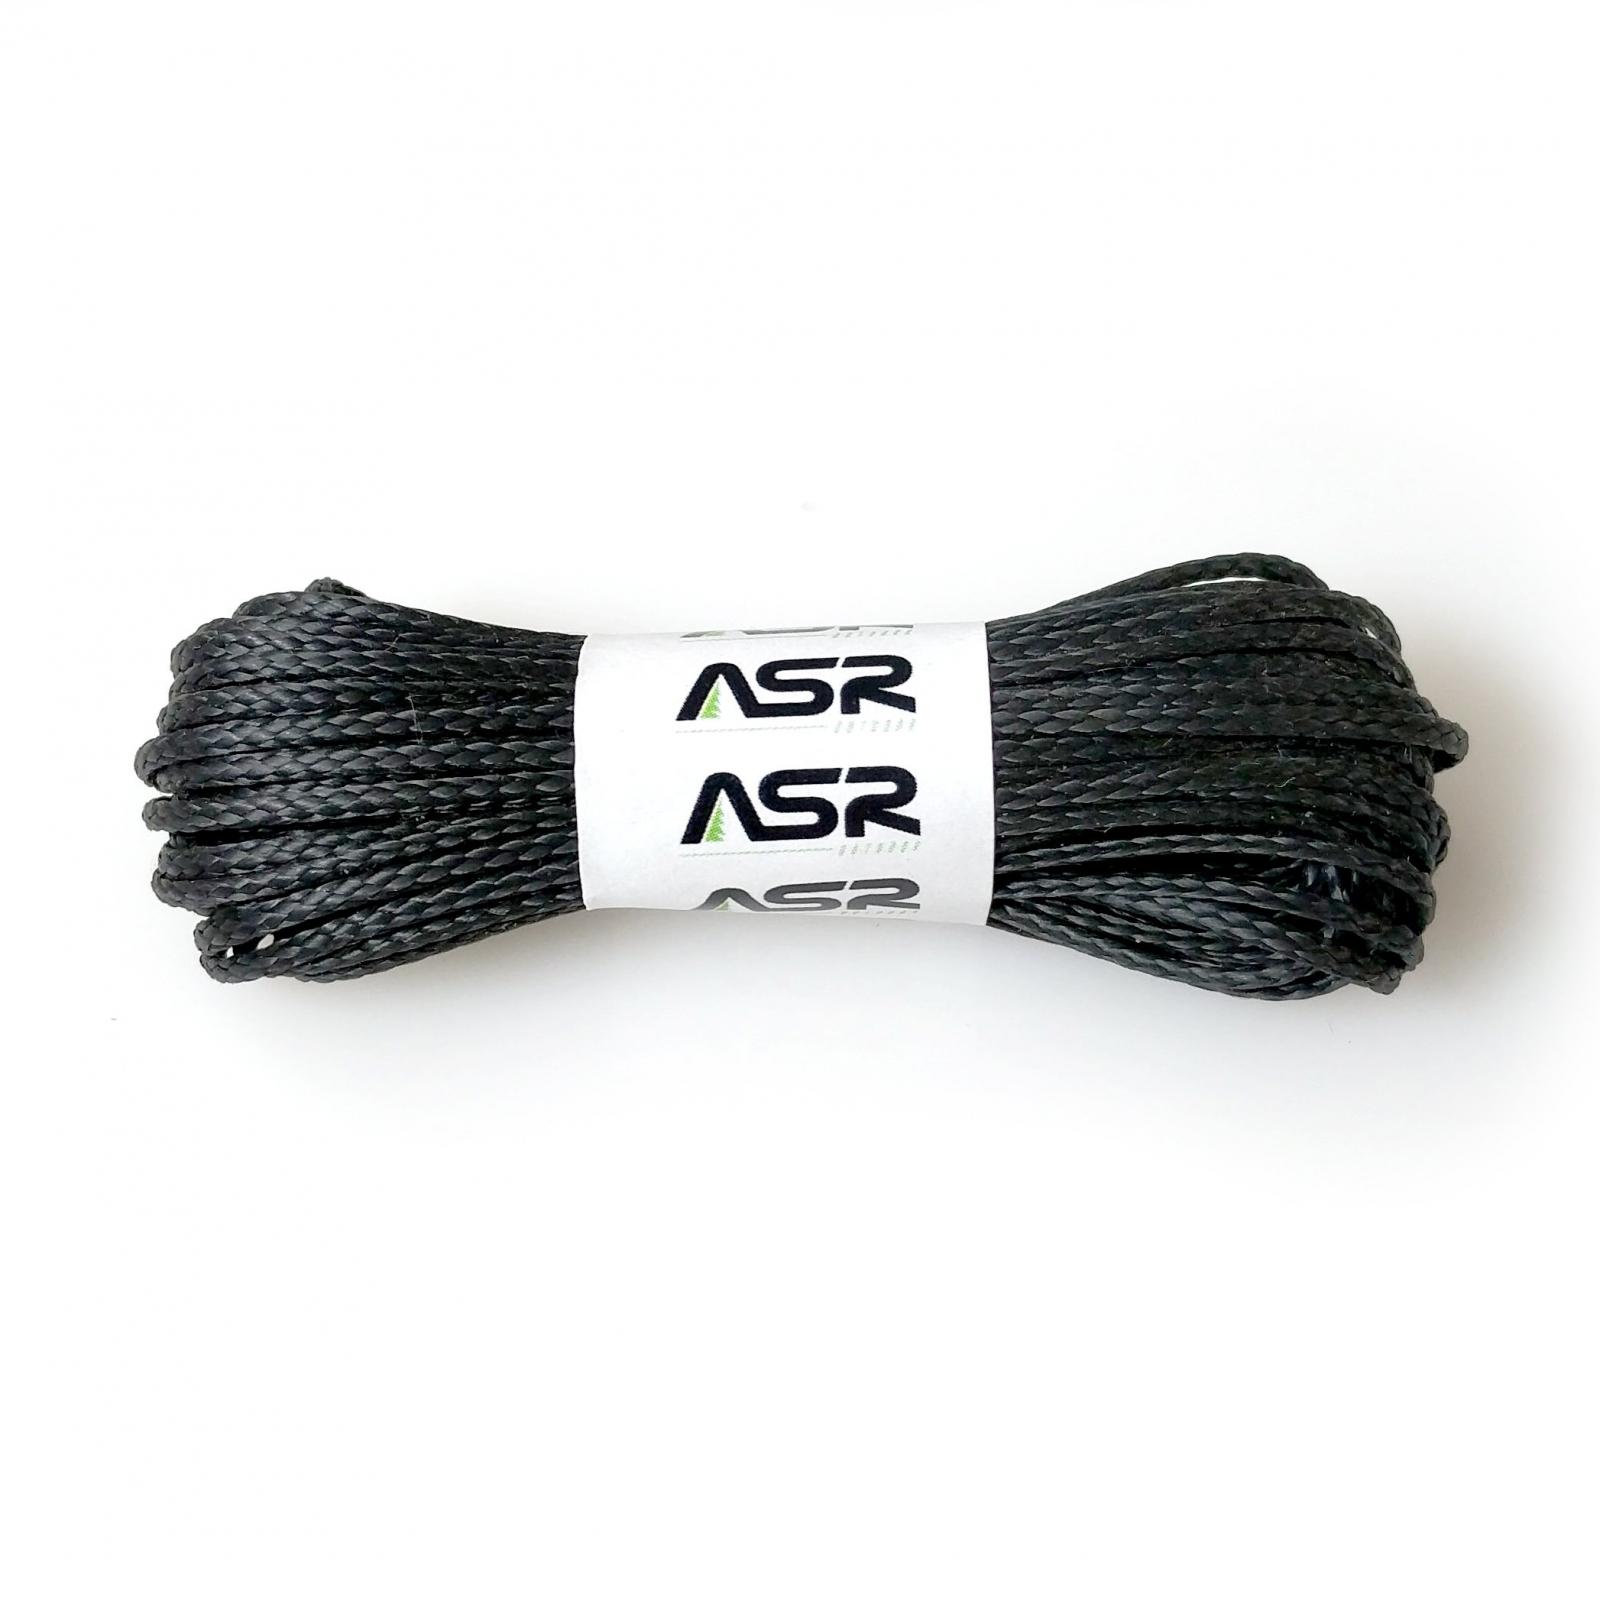 ASR Outdoor Technora Composite Survival Rope 400lb Breaking Strength 500ft Black